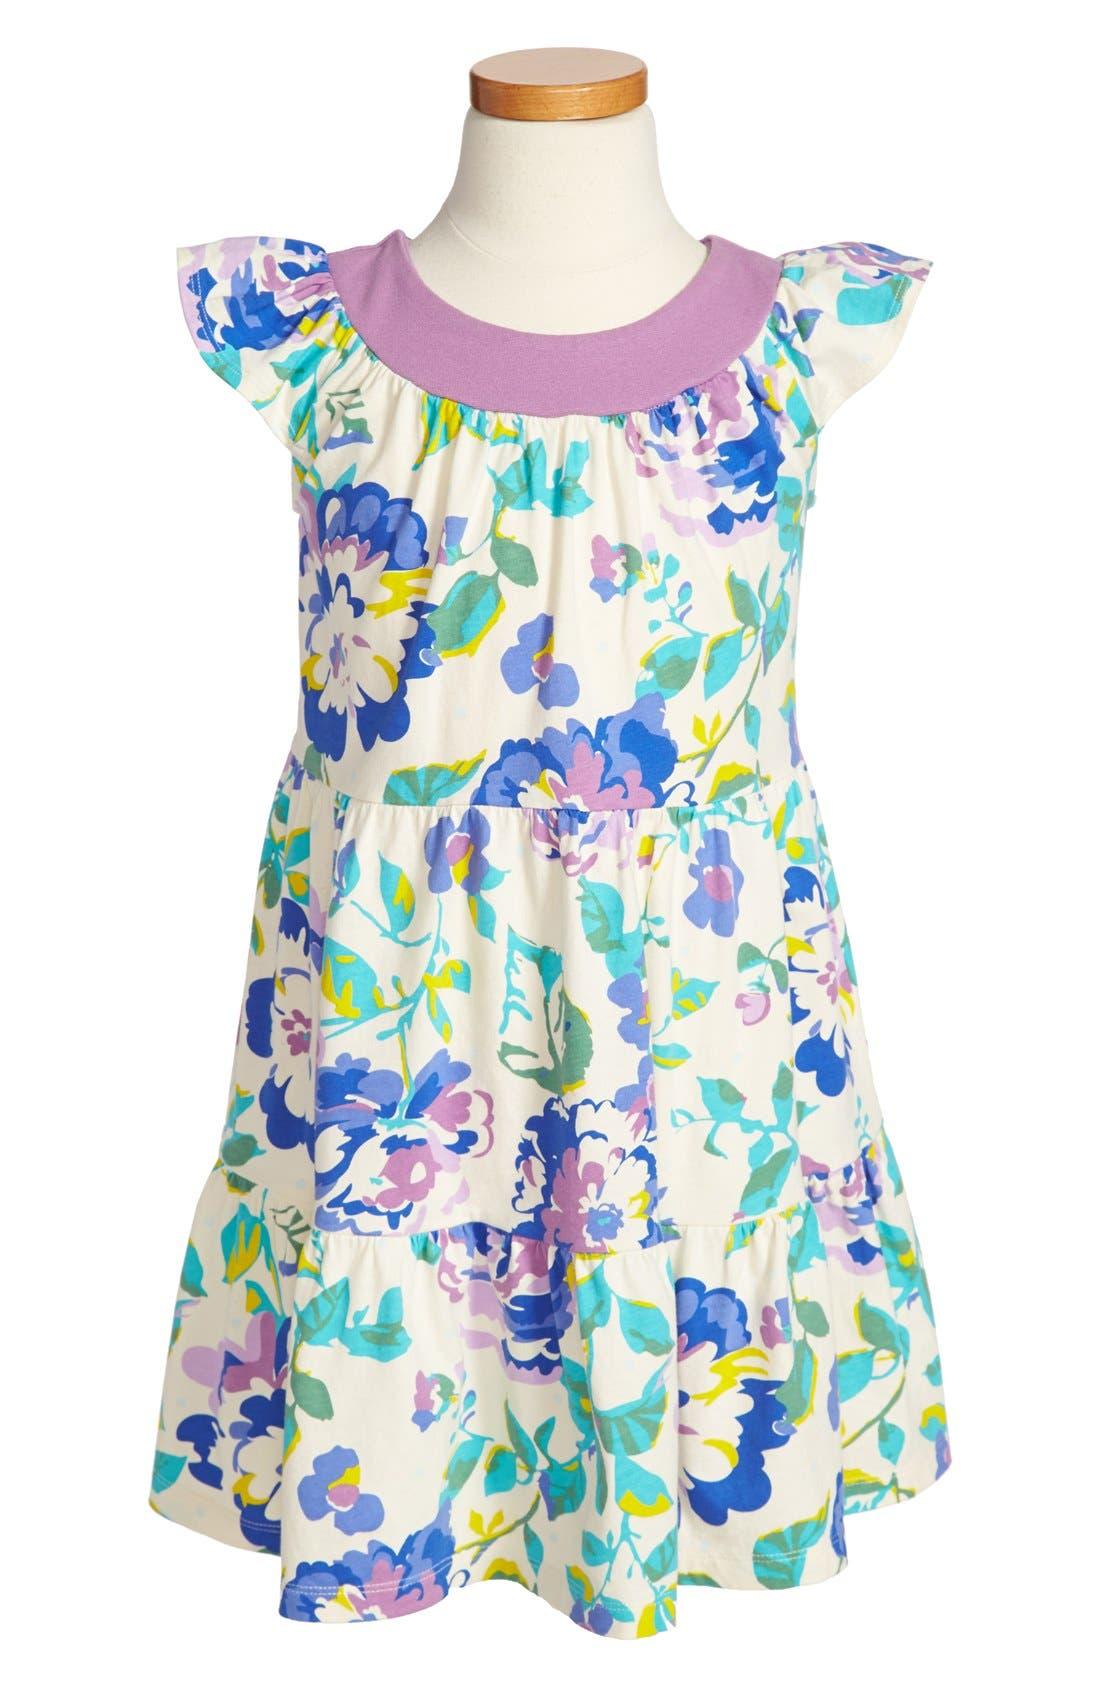 Alternate Image 1 Selected - Tea Collection 'Desert Rose' Twirl Dress (Toddler Girls, Little Girls & Big Girls)